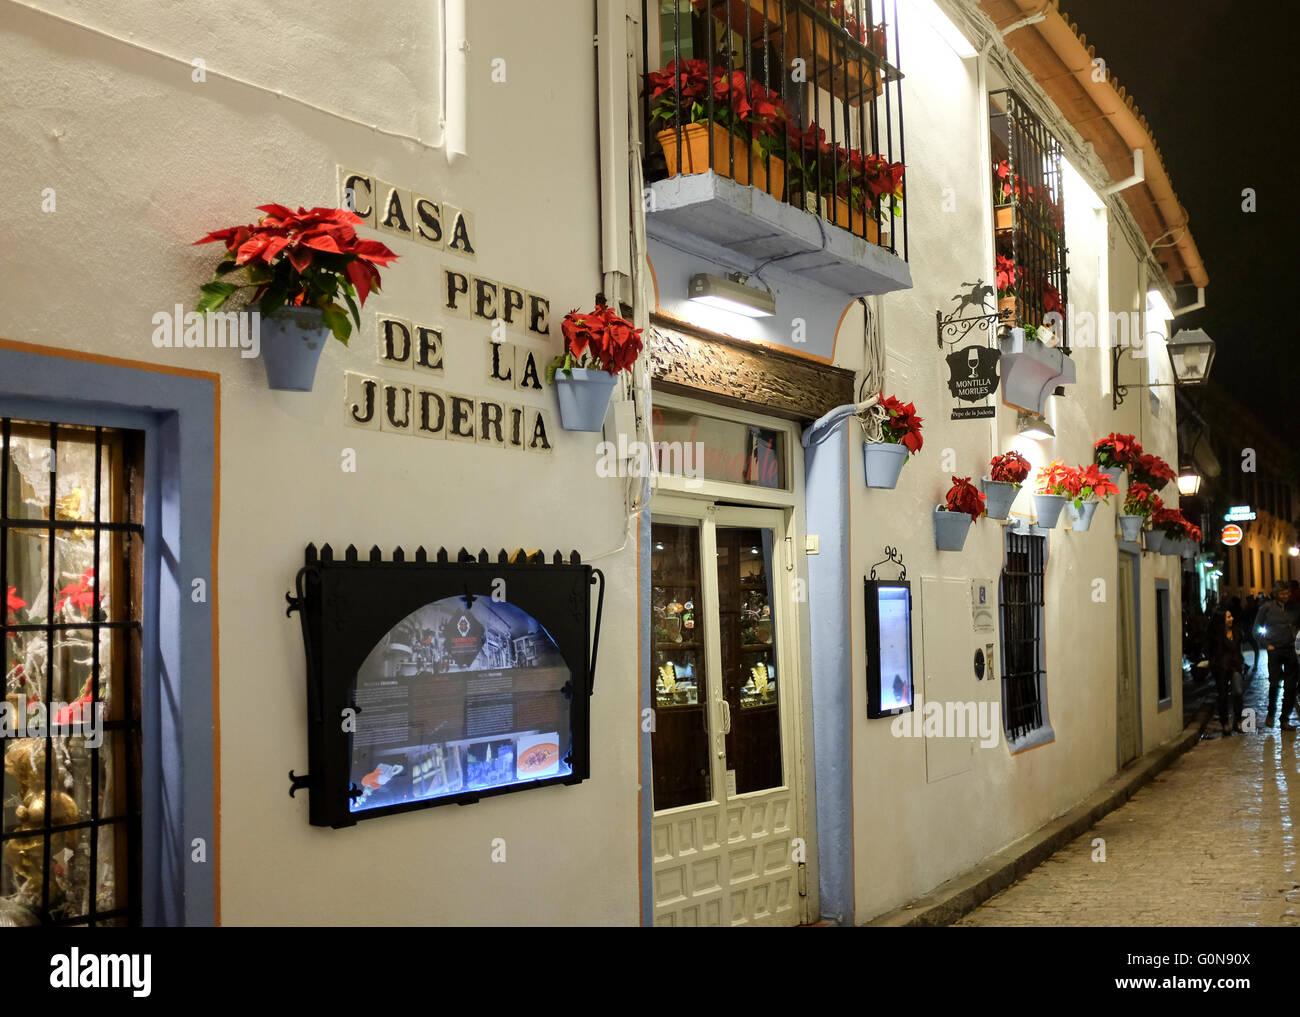 Casa Pepe De La Juderia Cordoba Spain Stock Photo